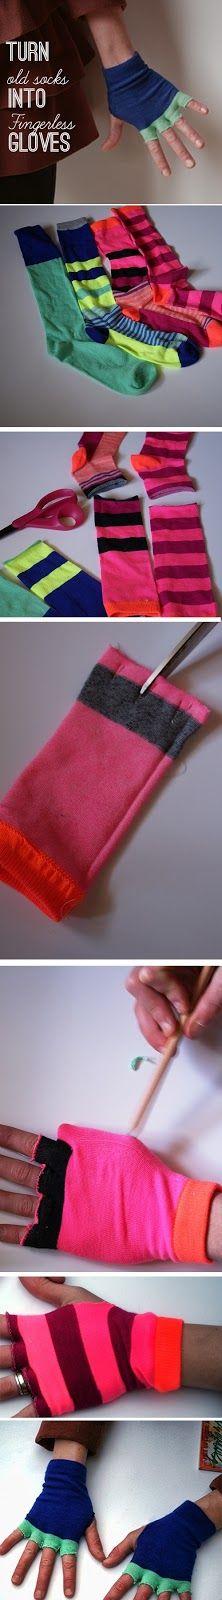 diy-gloves-010